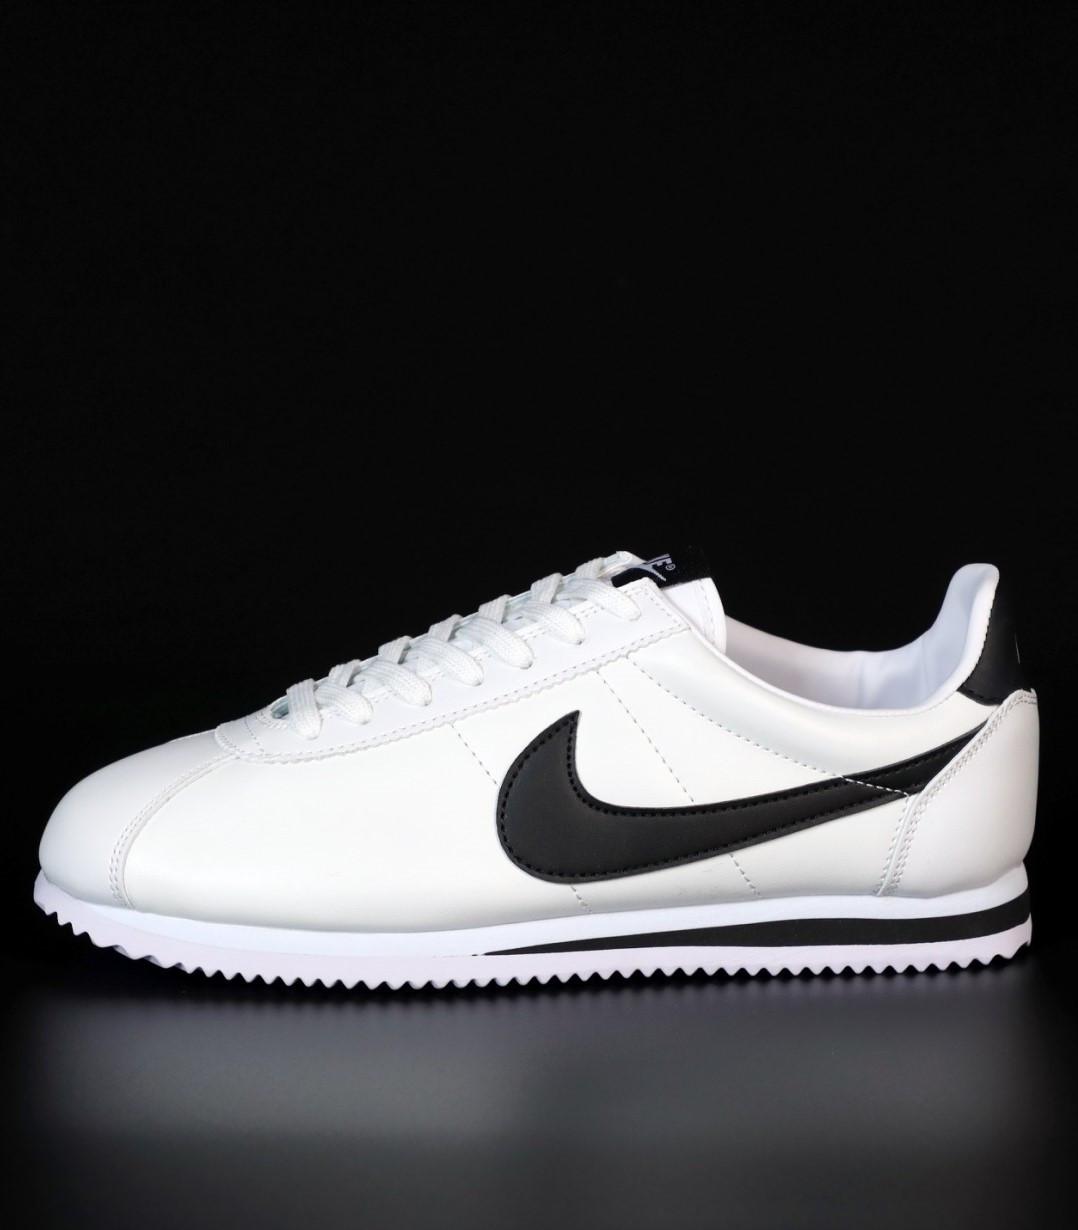 Женские кроссовки Nike Cortez Basic Leather White/Black (Найк Кортез)